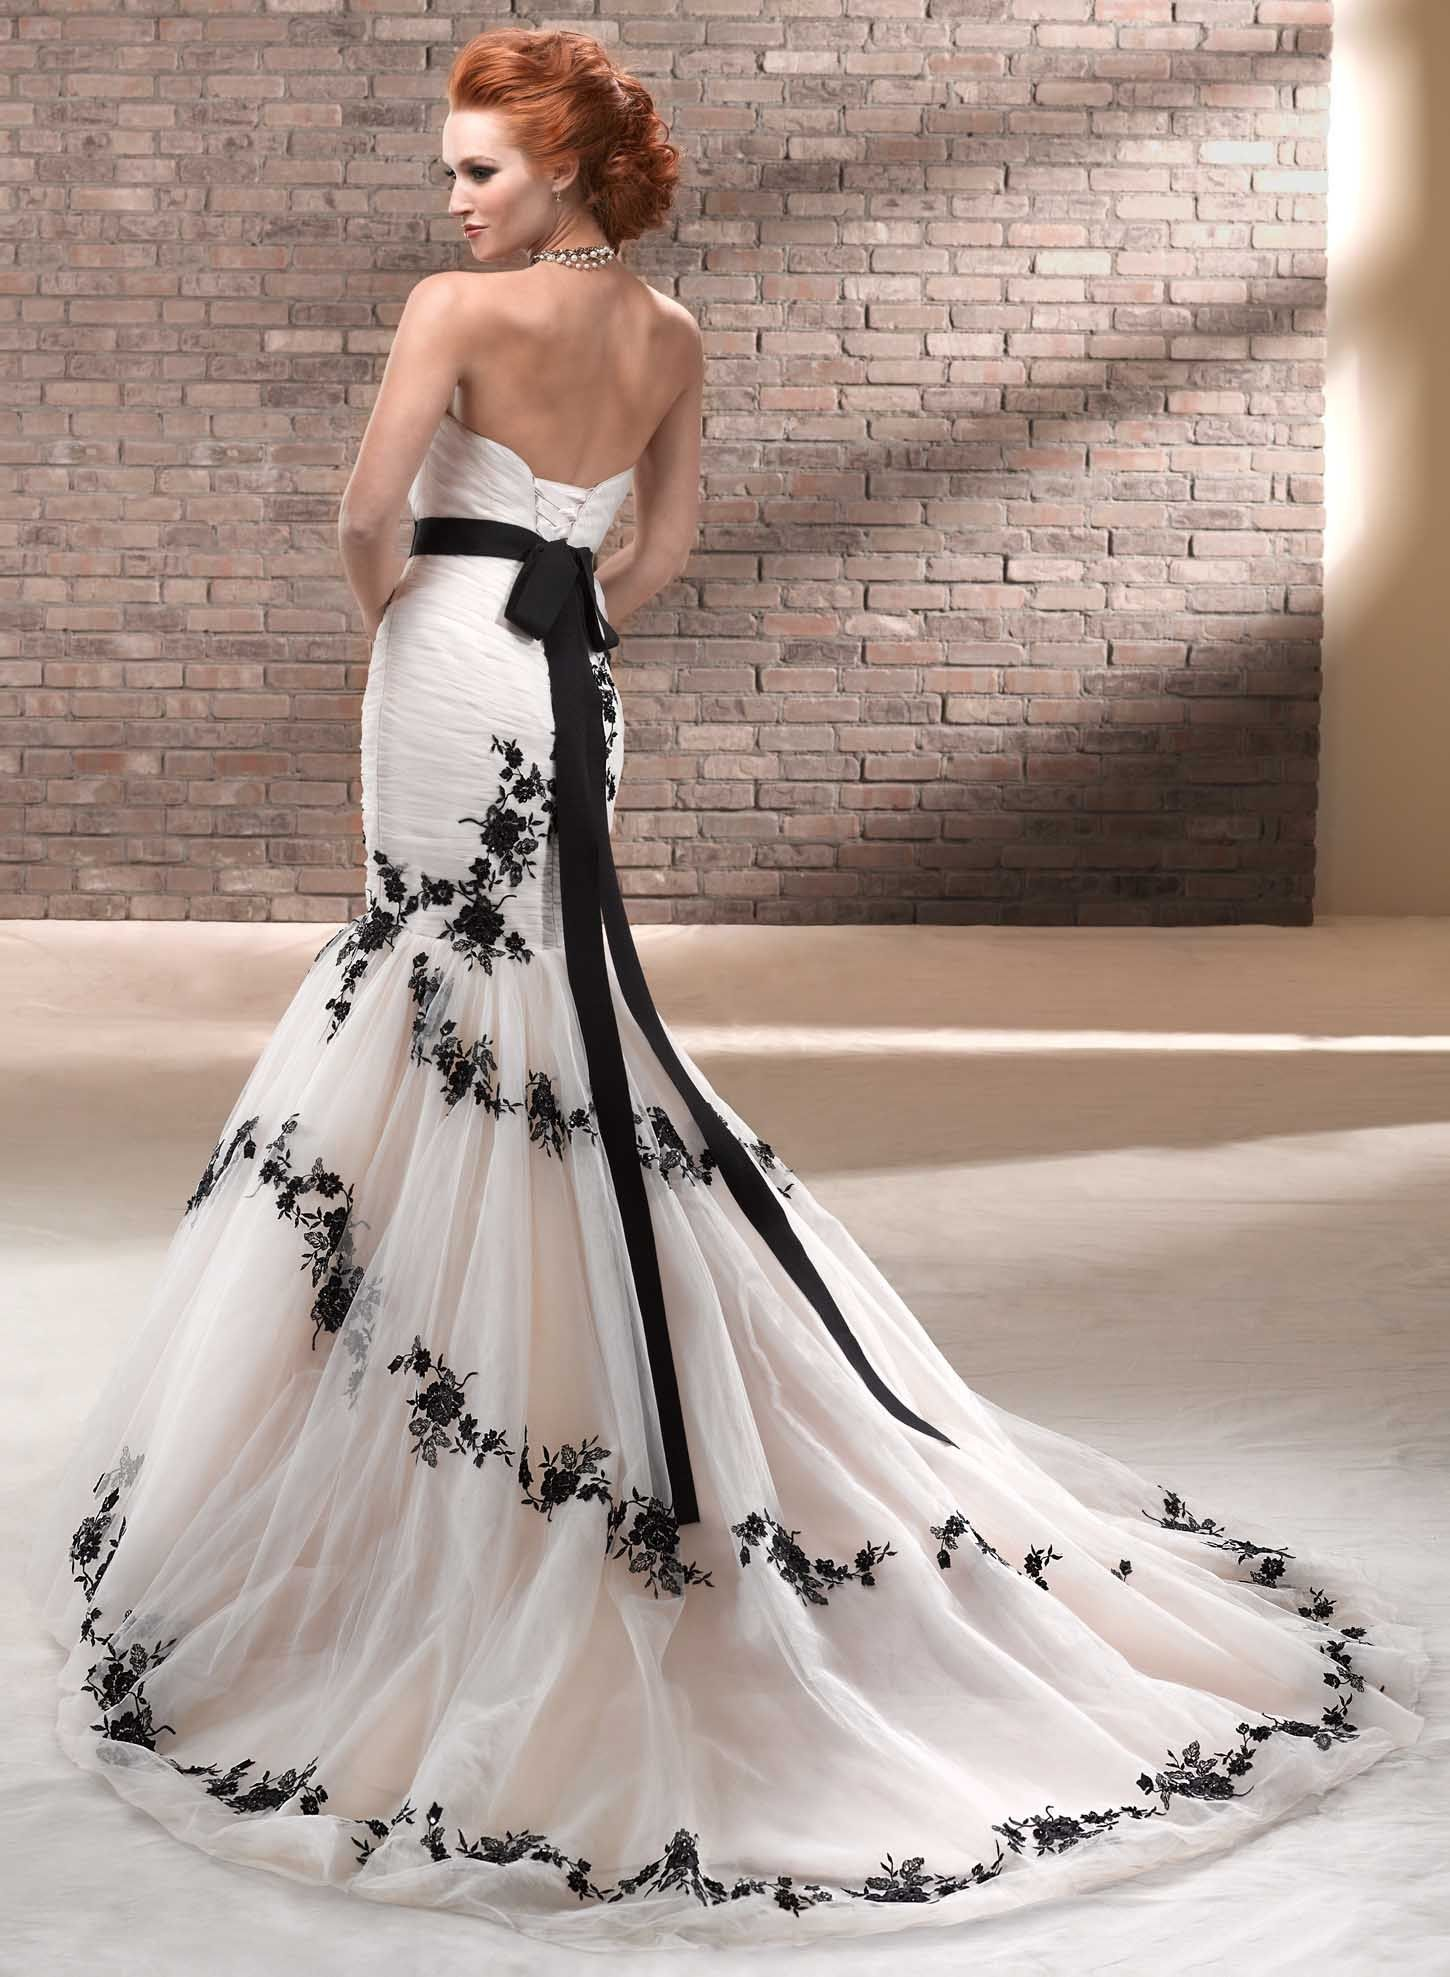 49 Lovely Cheap Black And White Wedding Dresses Pictures Wedding Dress Gallery White Lace Wedding Dress Black Wedding Dresses Colored Wedding Dresses [ 1977 x 1450 Pixel ]